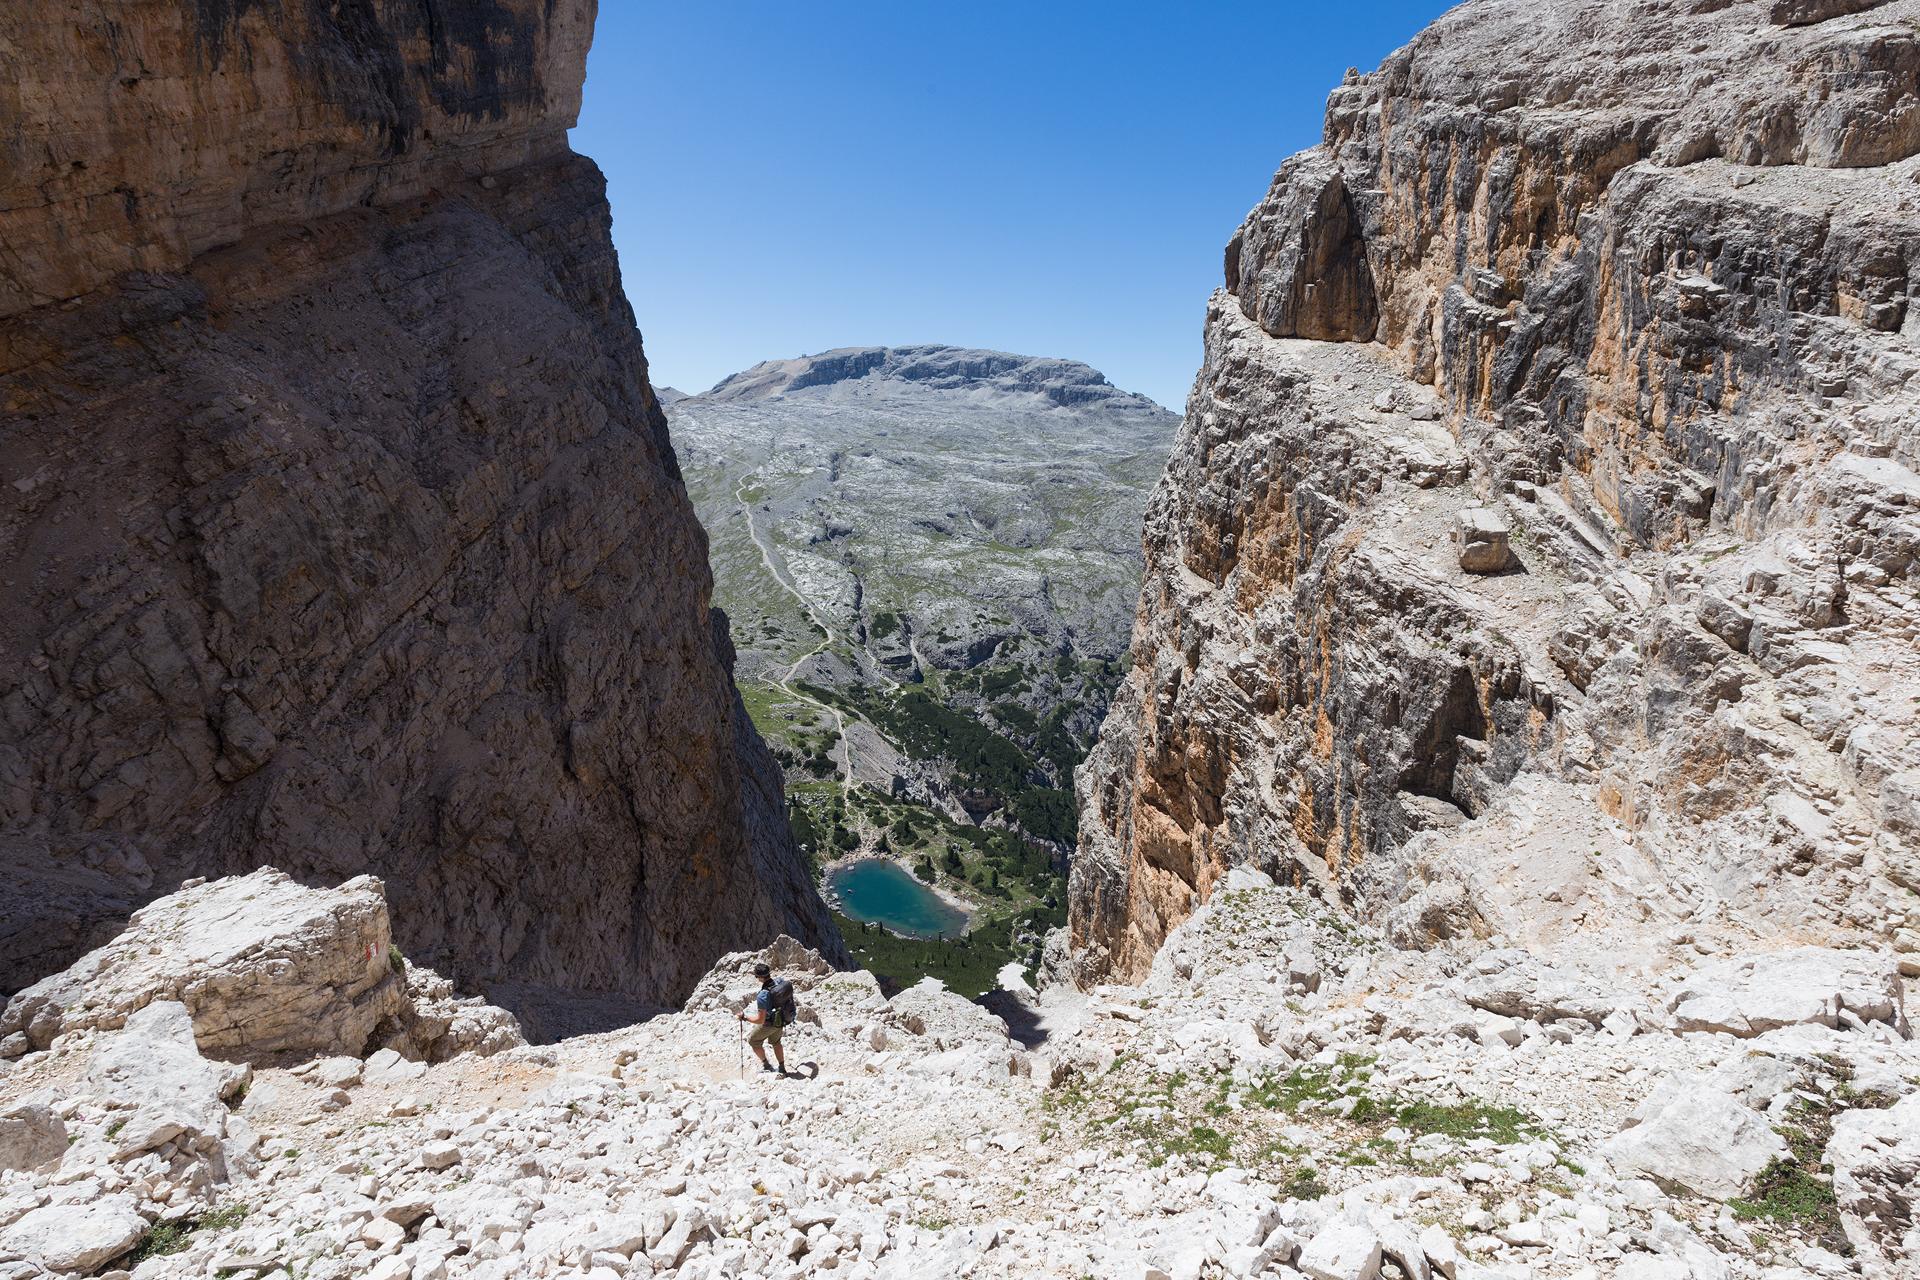 Descending towards Lago di Lagazuoi before heading back up the mountain in the distance where Rifugio Lagazuoi is located